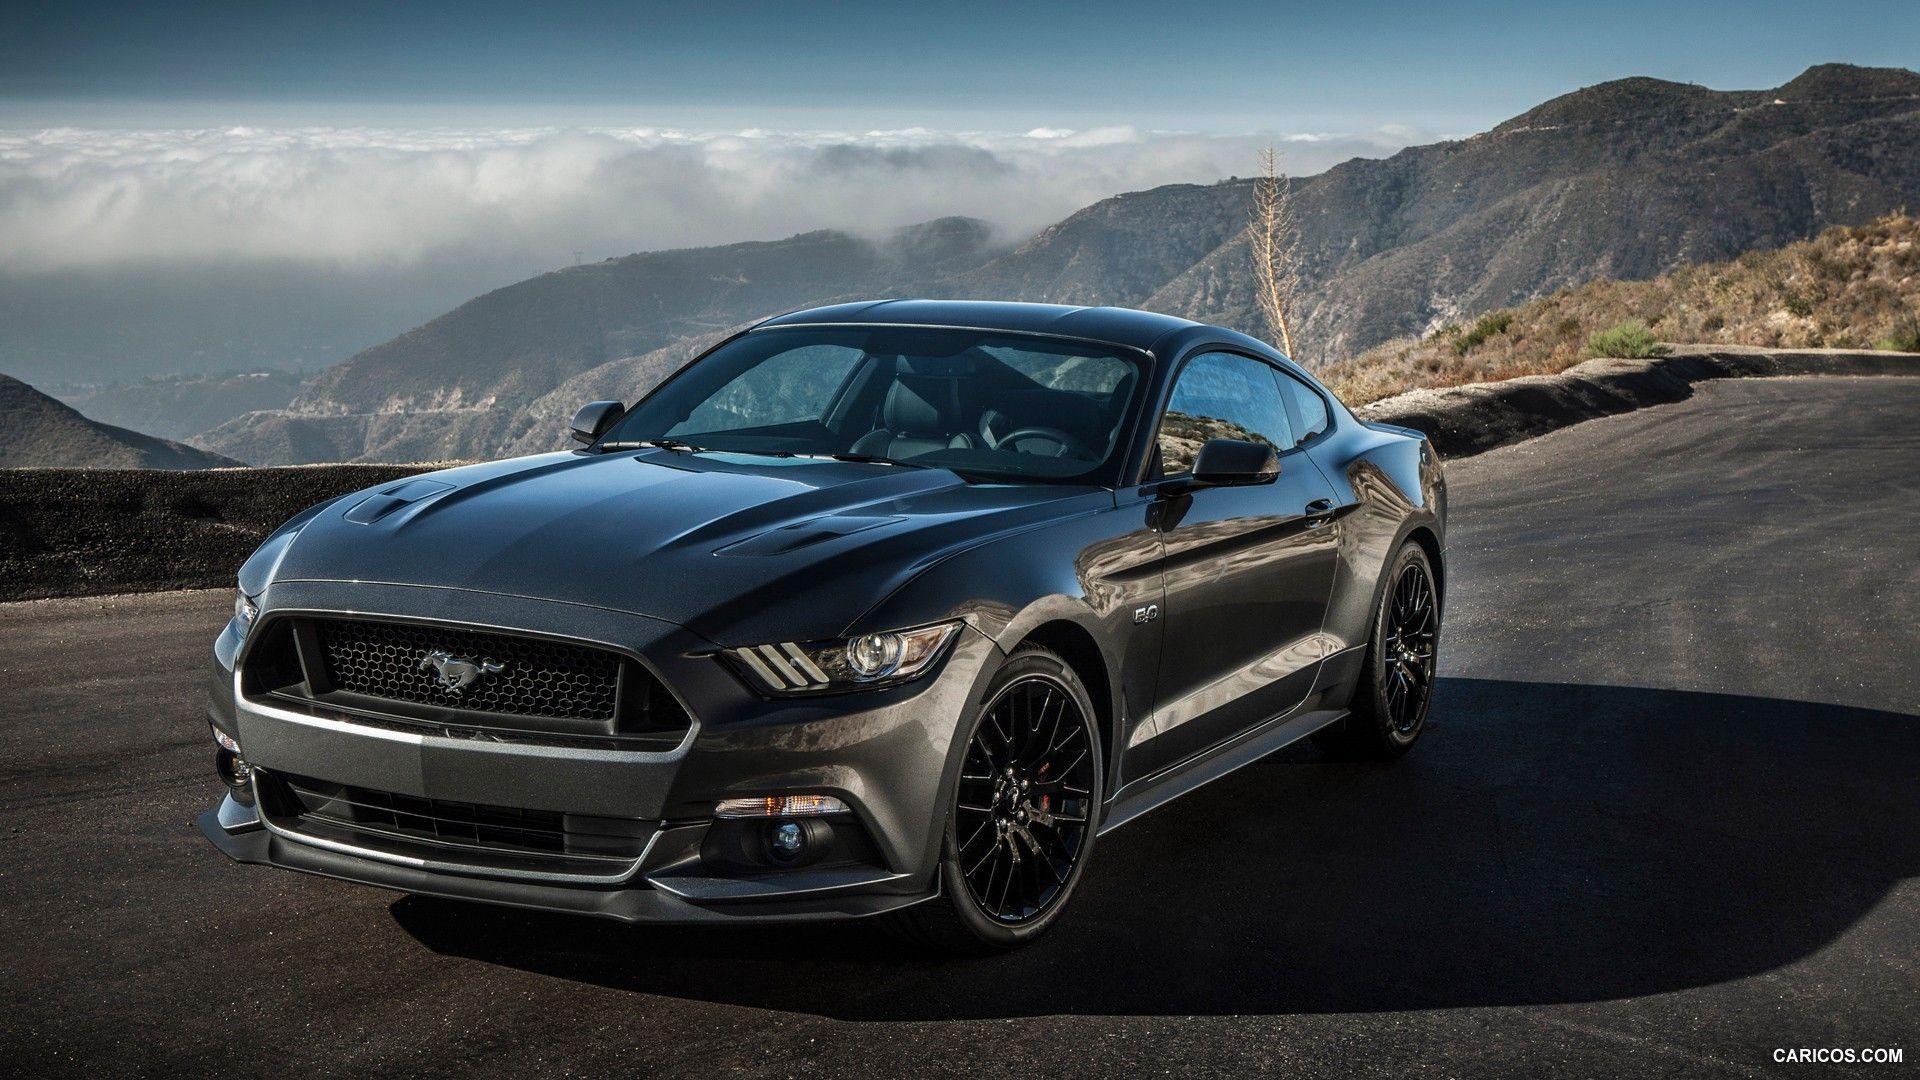 Beautiful Ford Mustang Gt Wallpaper